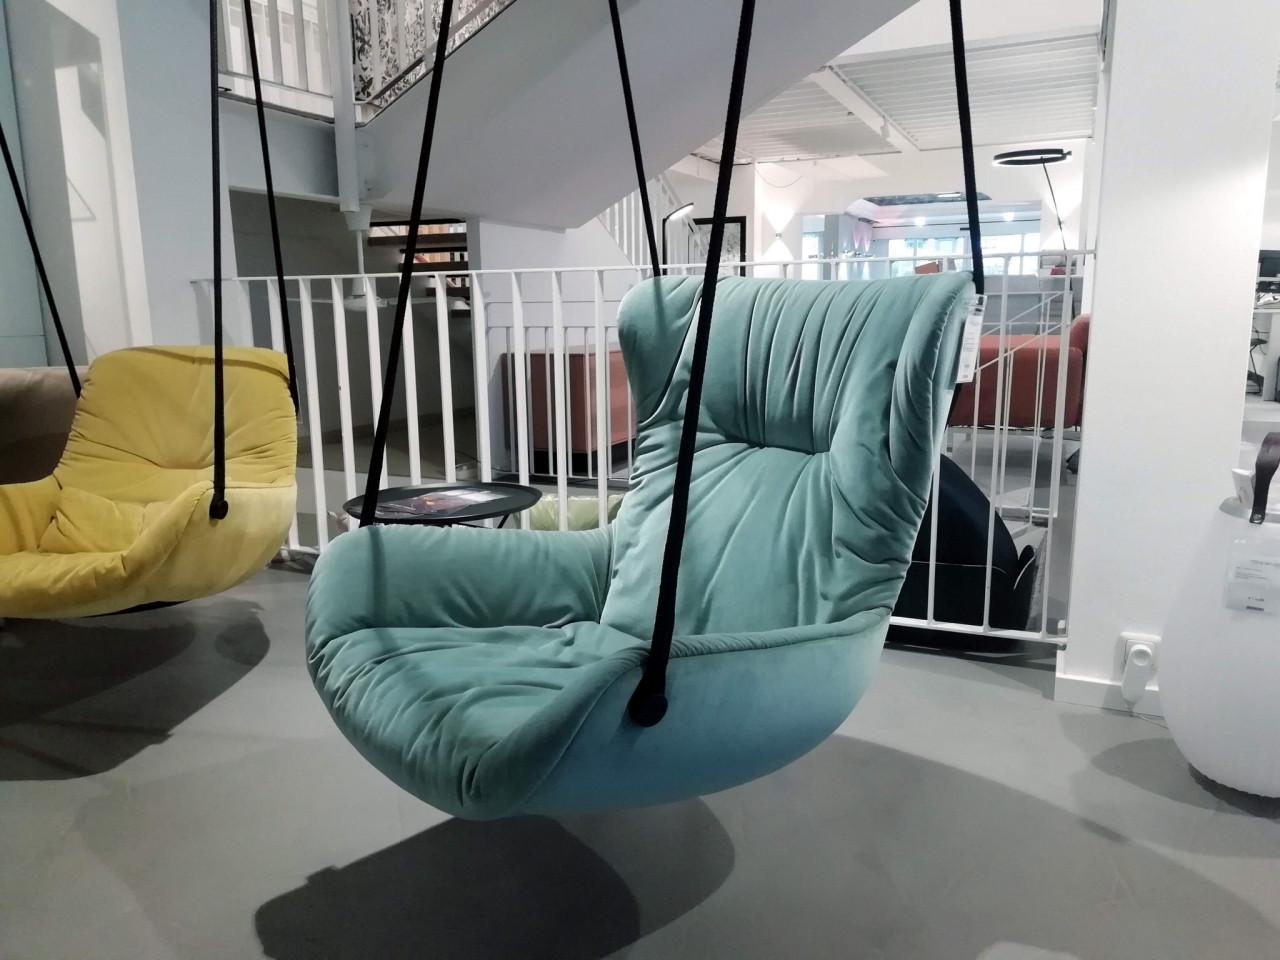 Leya Wingback Swing Seat Von Freifrau Designermobel Furth